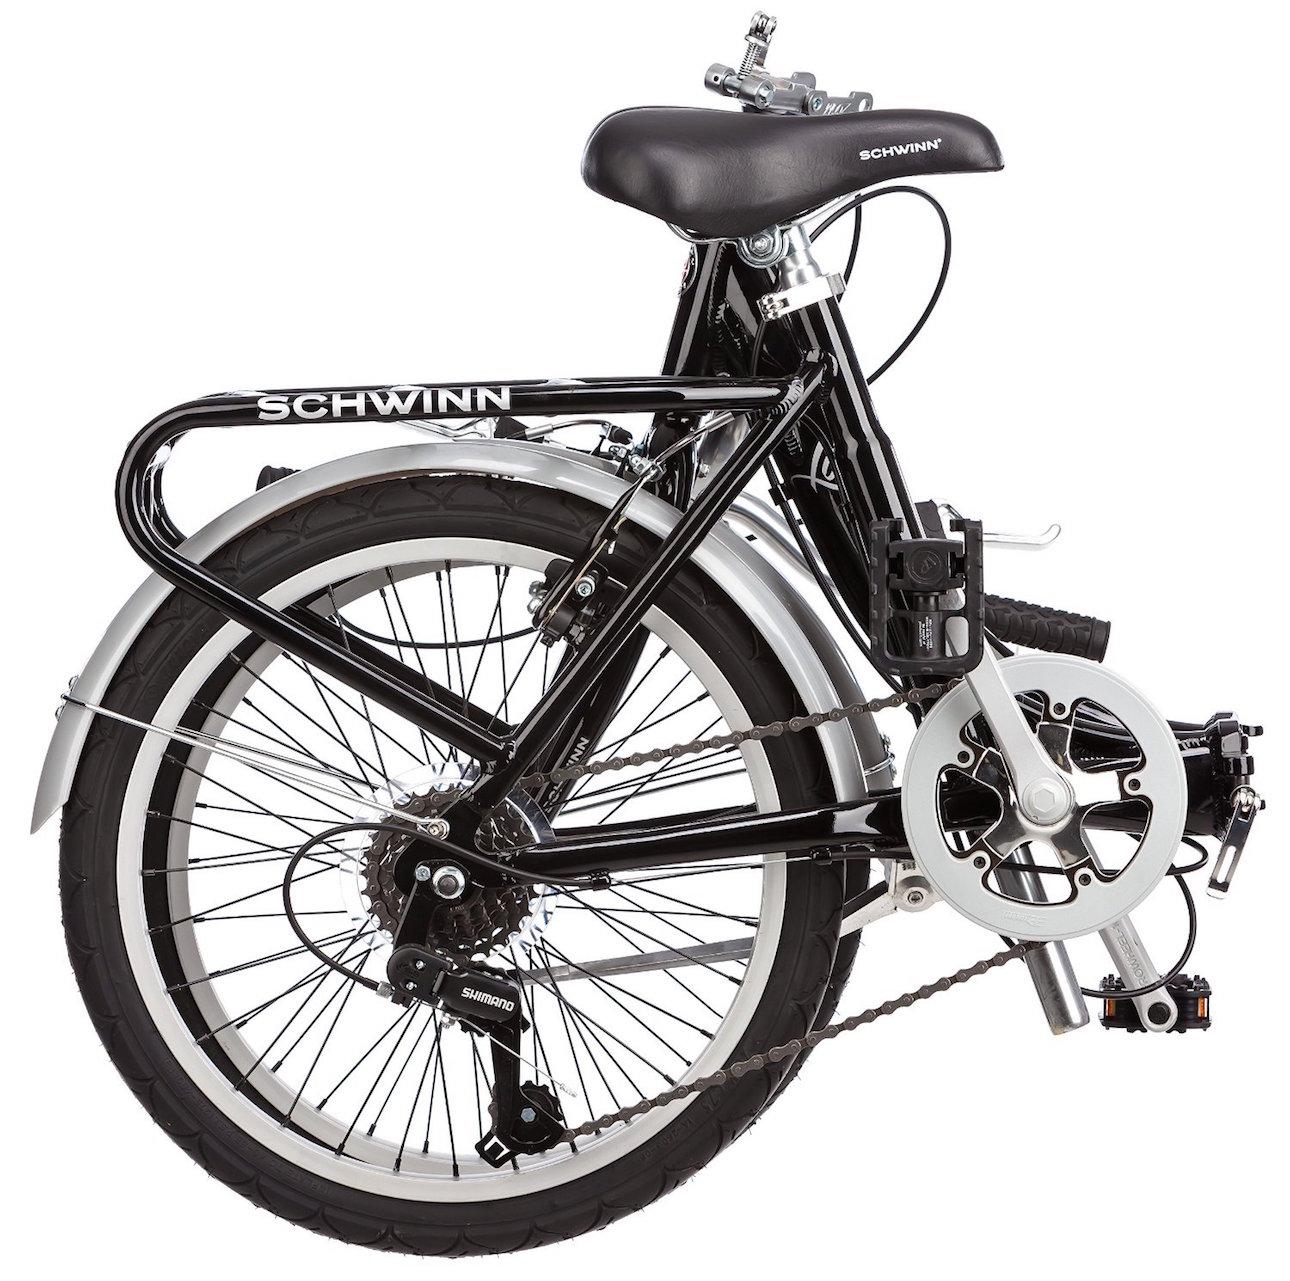 Schwinn Loop Folding Bike Review Cheap Secure And Easy